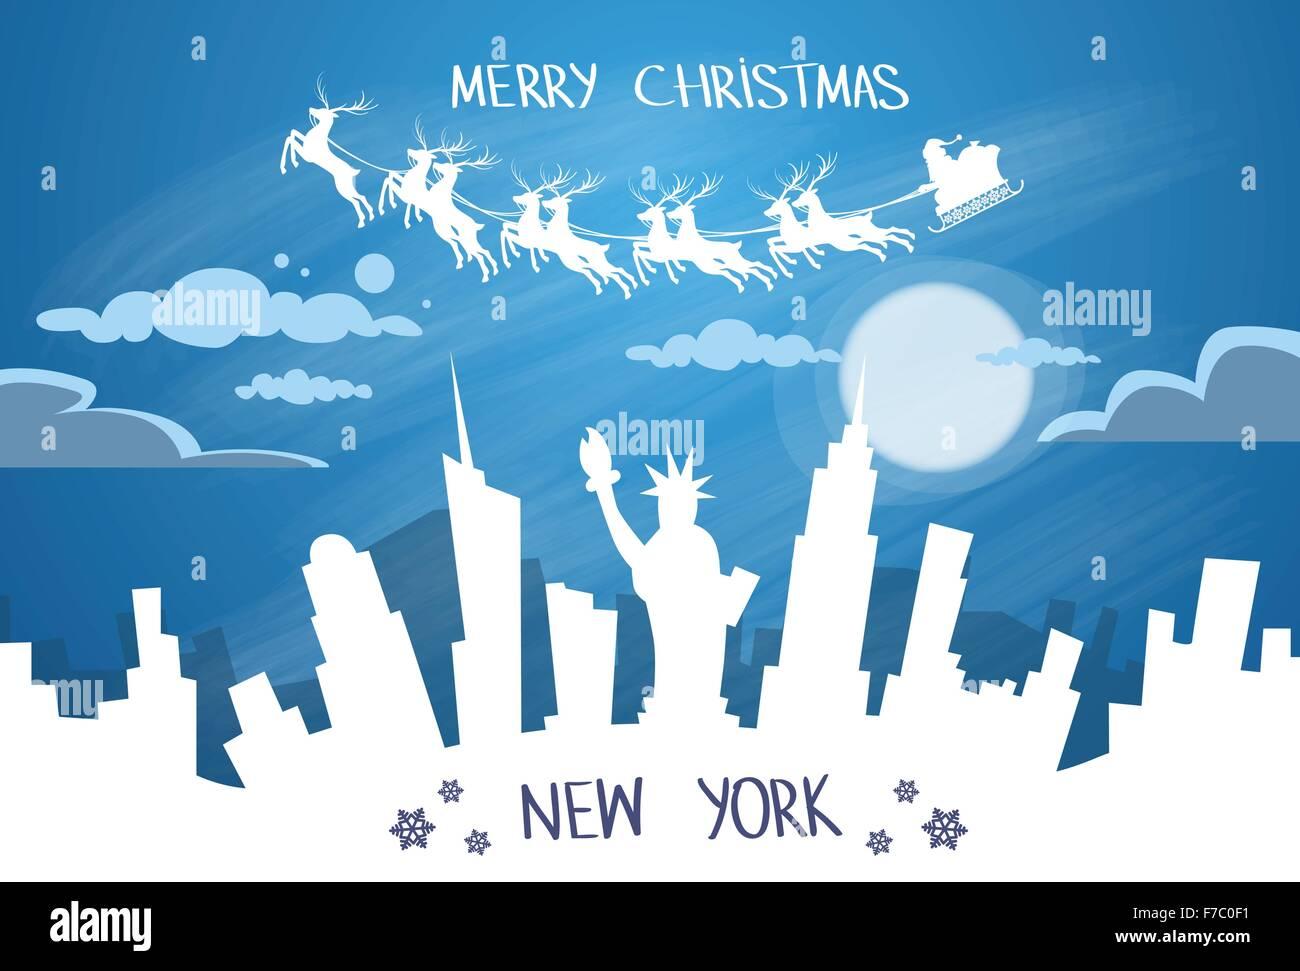 Santa Claus Sleigh Reindeer Fly Sky over New York City USA Silhouette - Stock Image